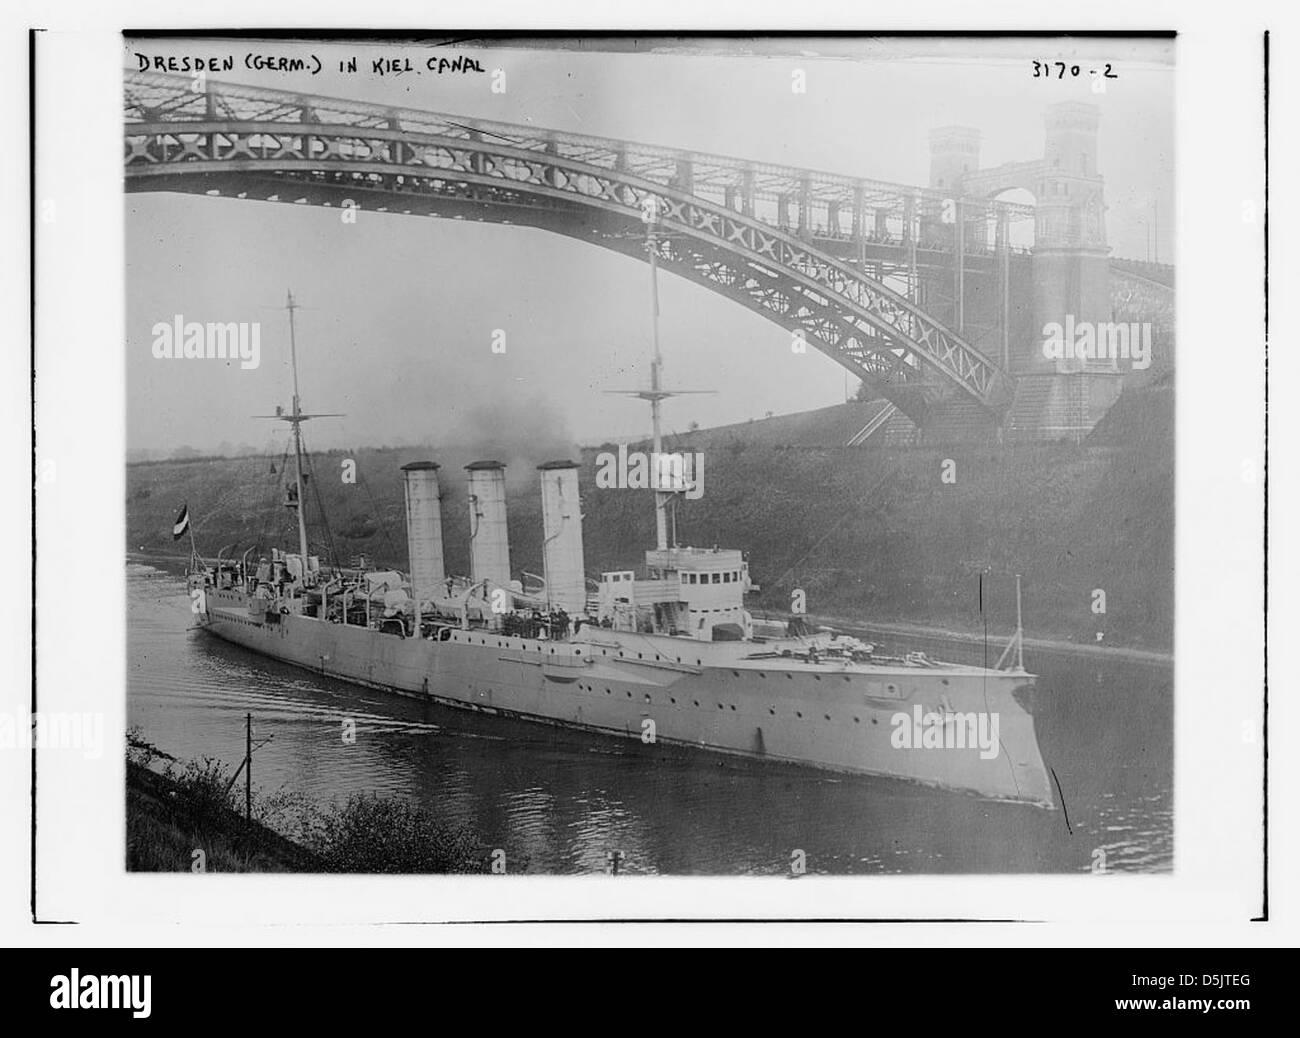 DRESDEN (Germ.) in Kiel Canal (LOC) - Stock Image